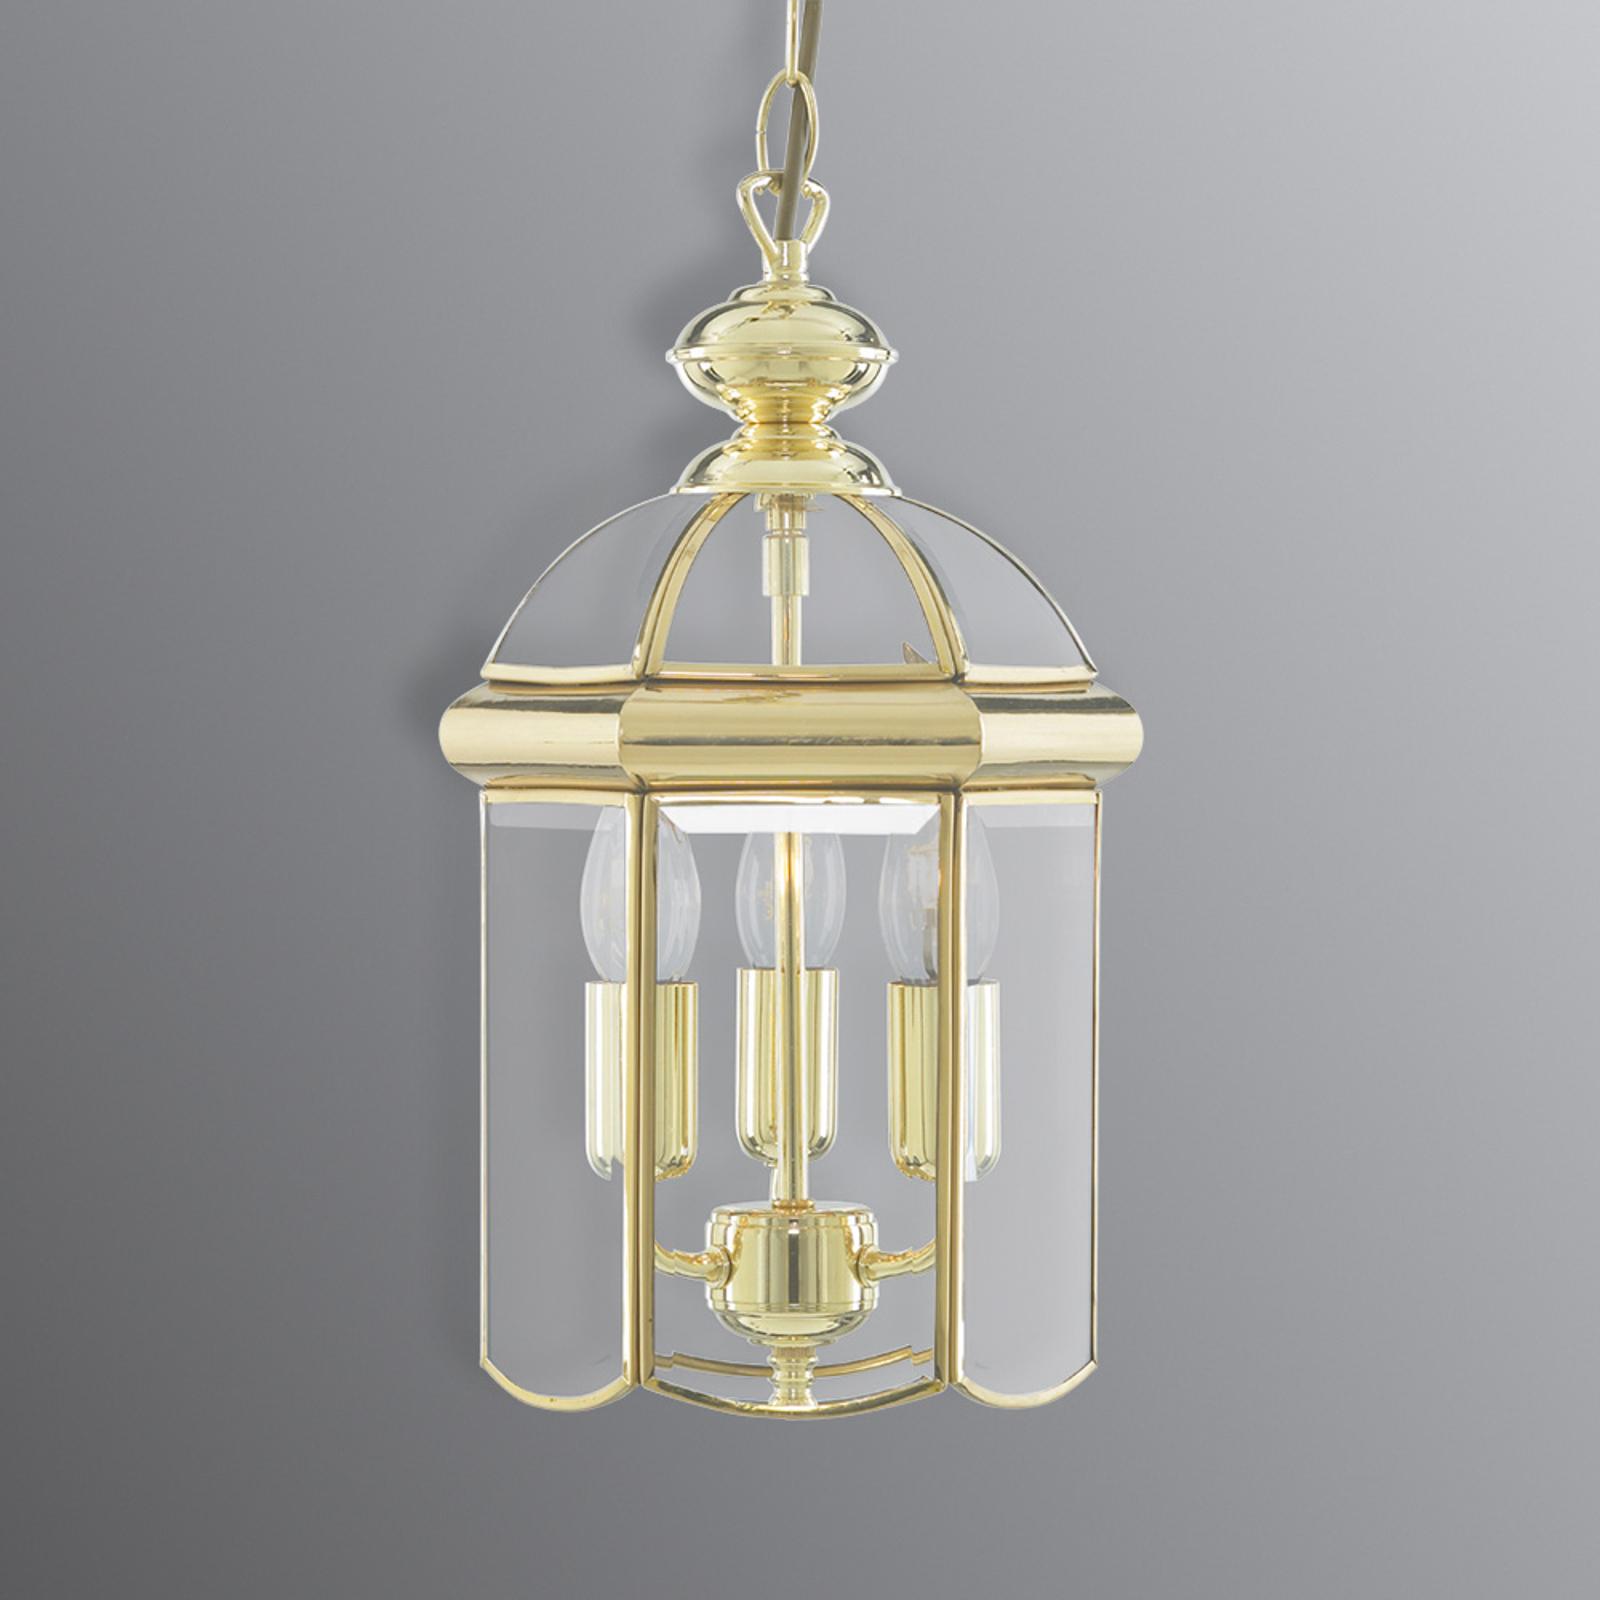 Hanglamp Arlind, Ø 22 cm, messing